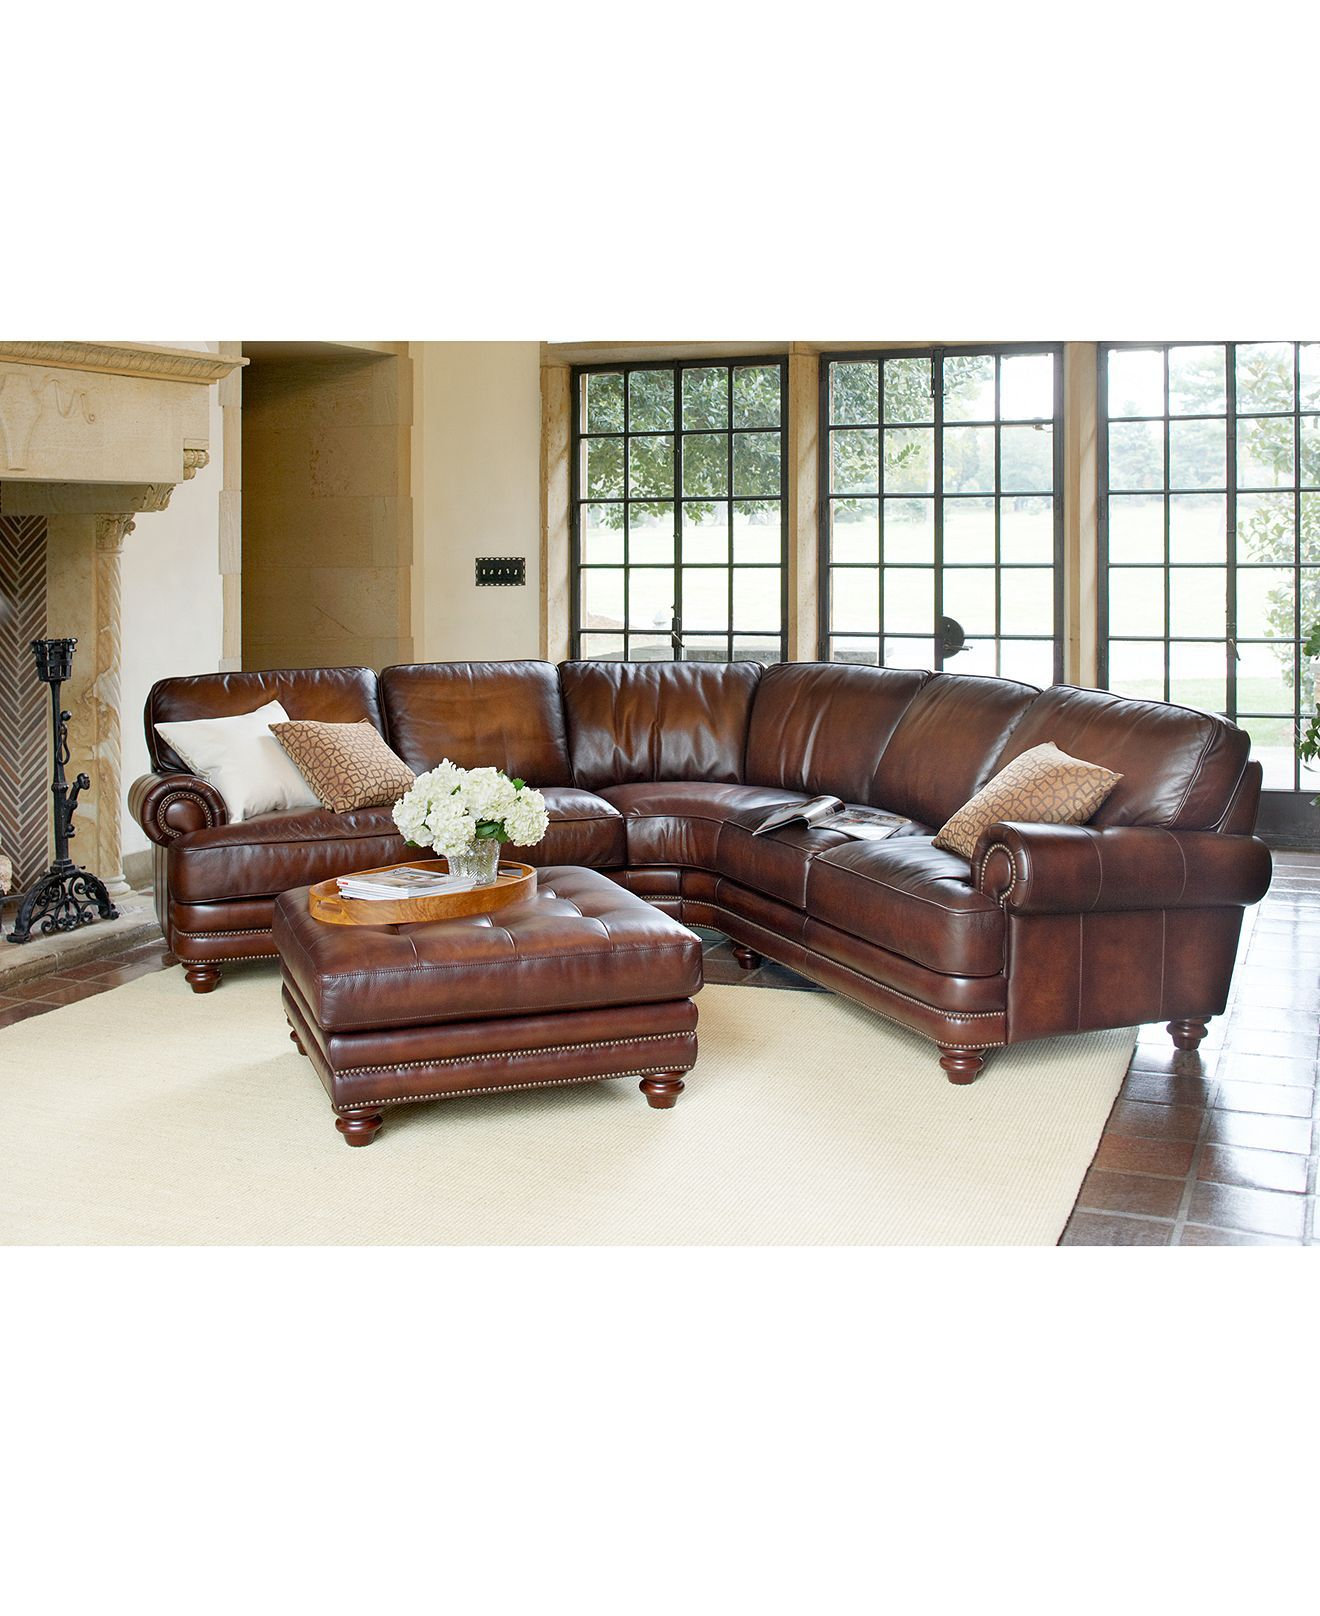 Brett Living Room Furniture Sets & Pieces Living Room Furniture